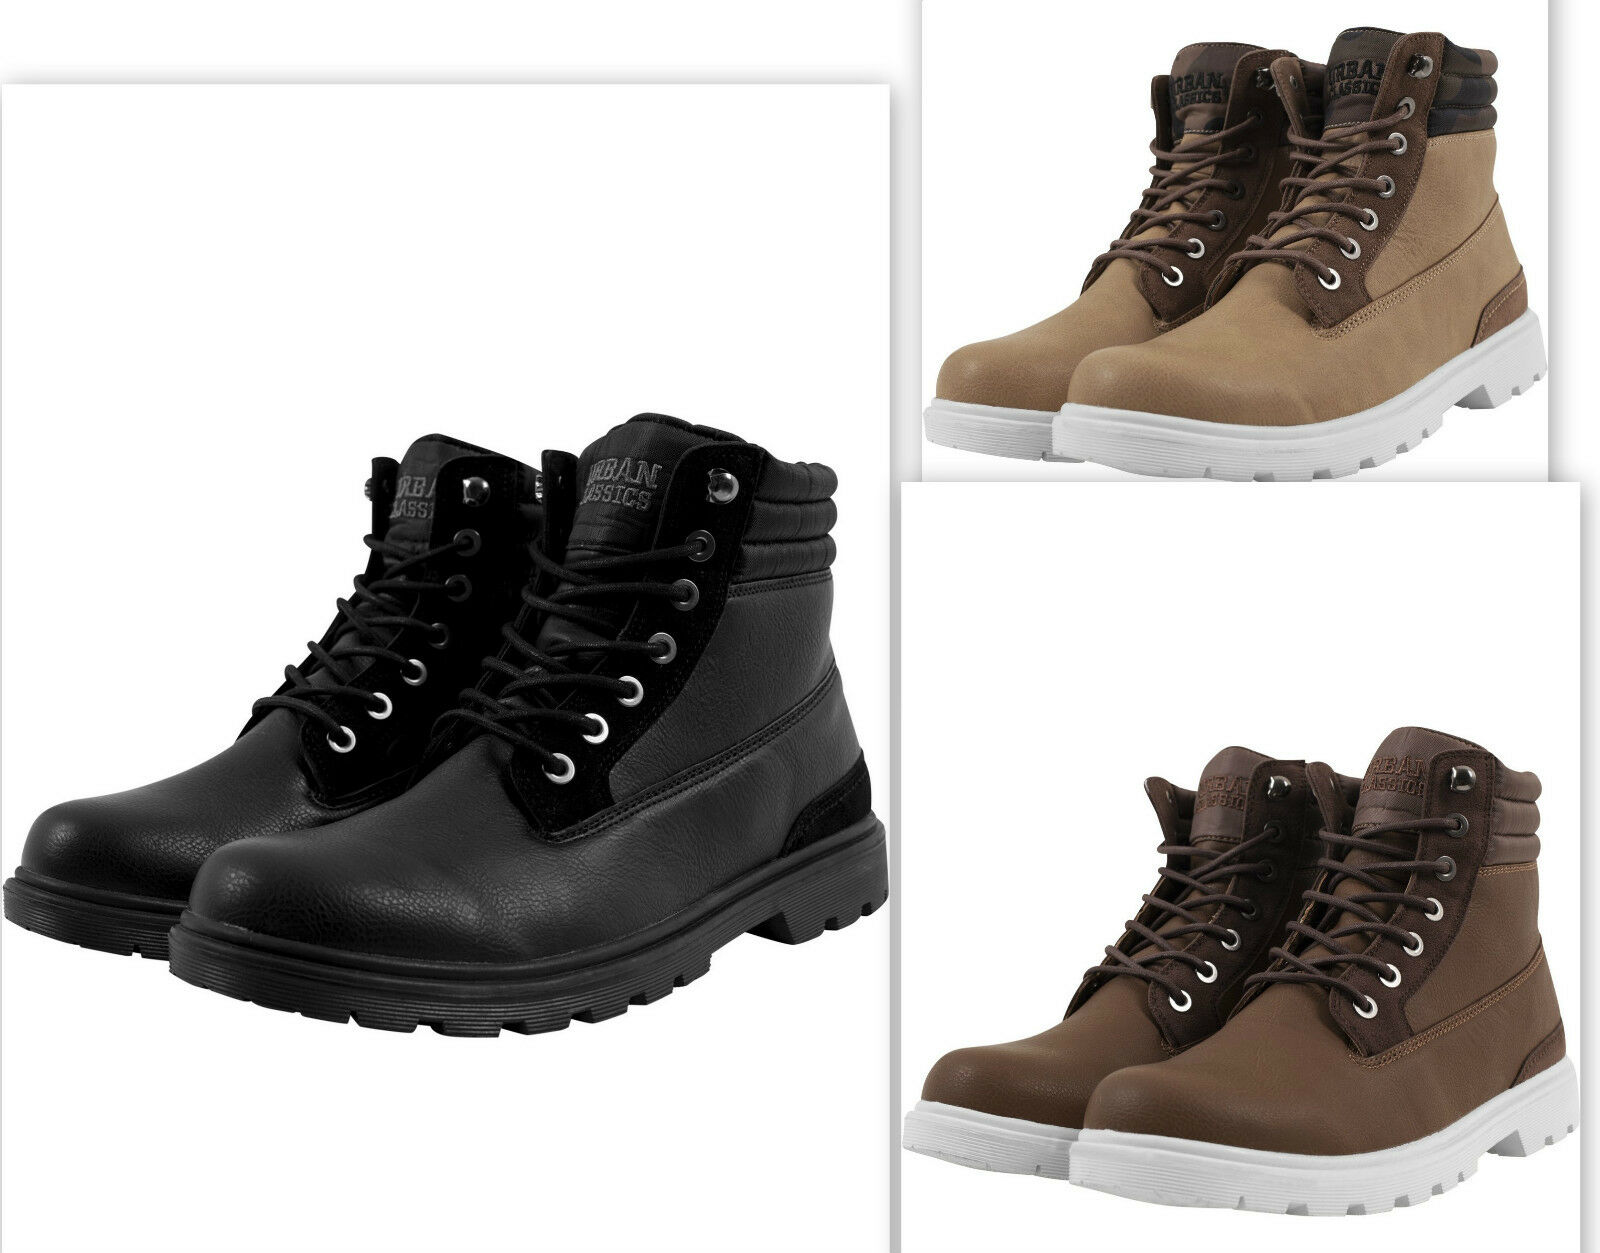 URBAN CLASSICS Zapatos Invierno Botas Botas militares hombre Invierno Zapatos botas TB1293 9e7132